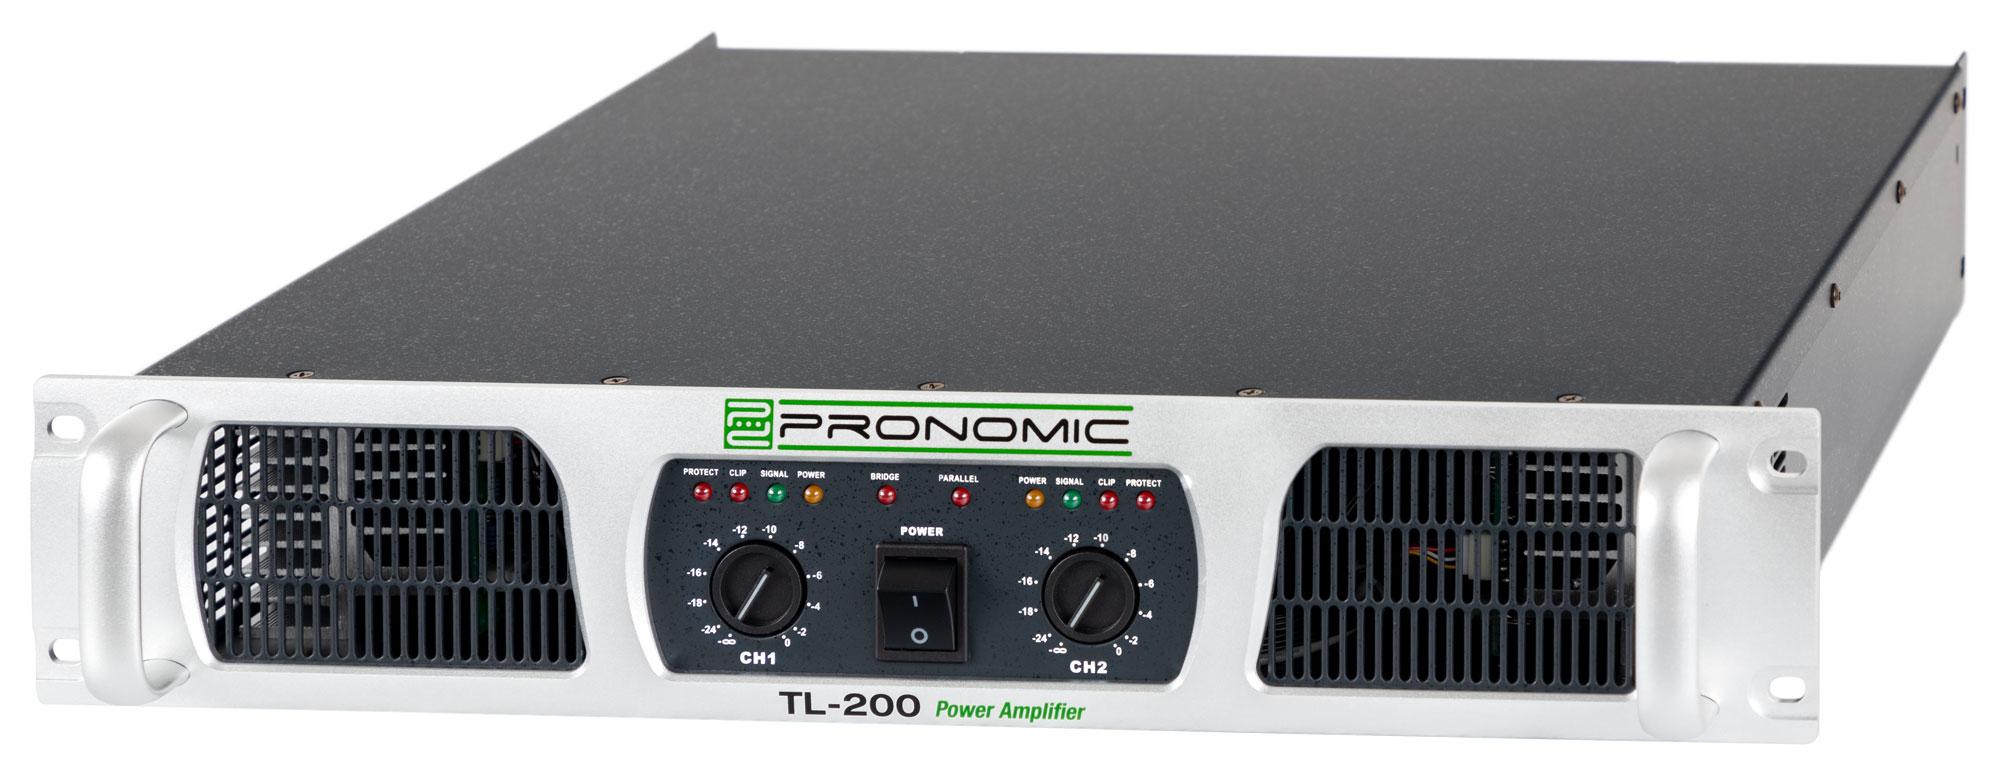 Paendstufen - Pronomic TL 200 Endstufe 2x 500 Watt - Onlineshop Musikhaus Kirstein